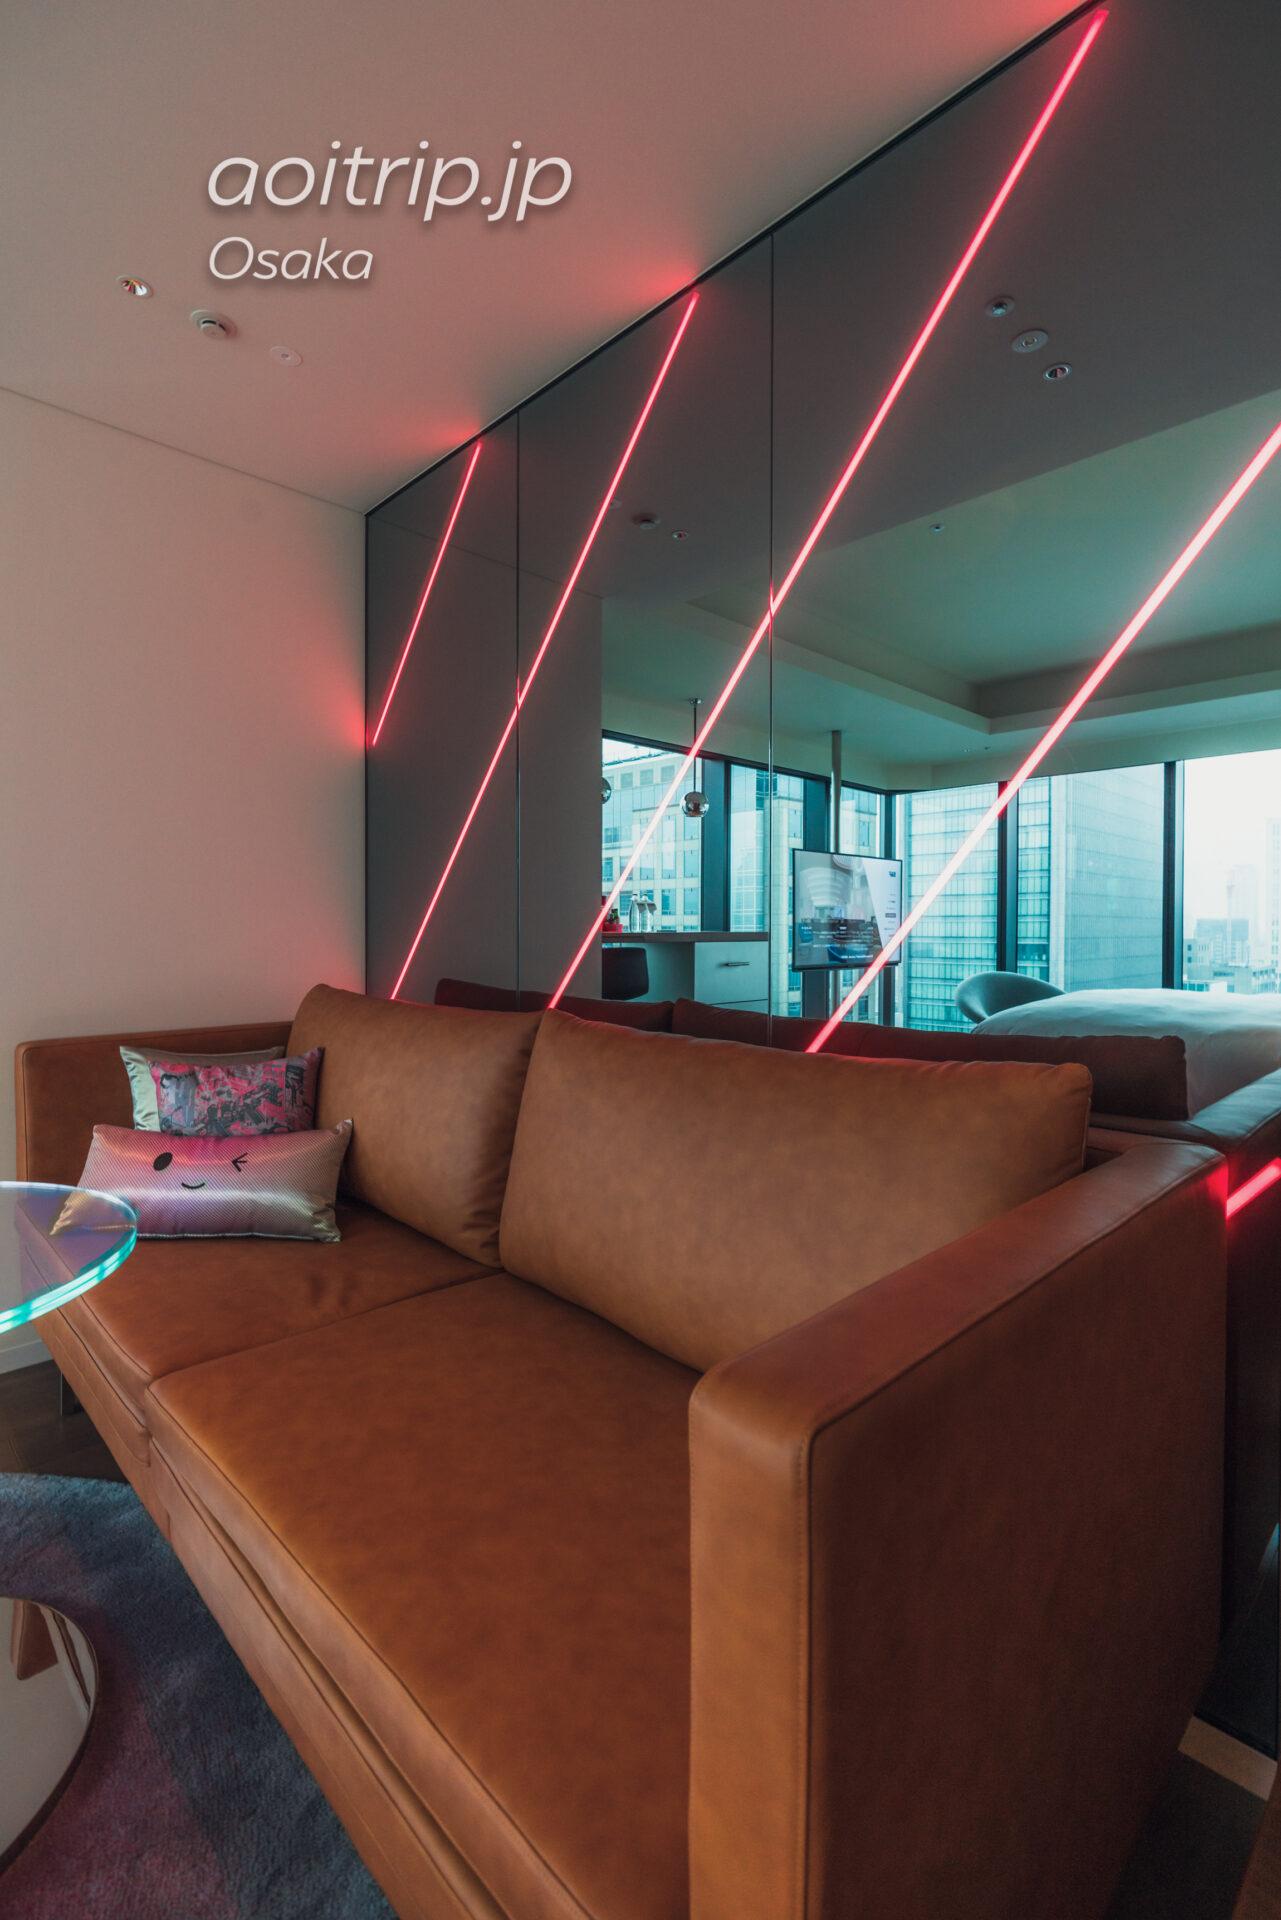 w大阪 スペクタキュラー, 1 キング, シティビュー, コーナールーム Spectacular Guest room, 1 King, City view, Corner room